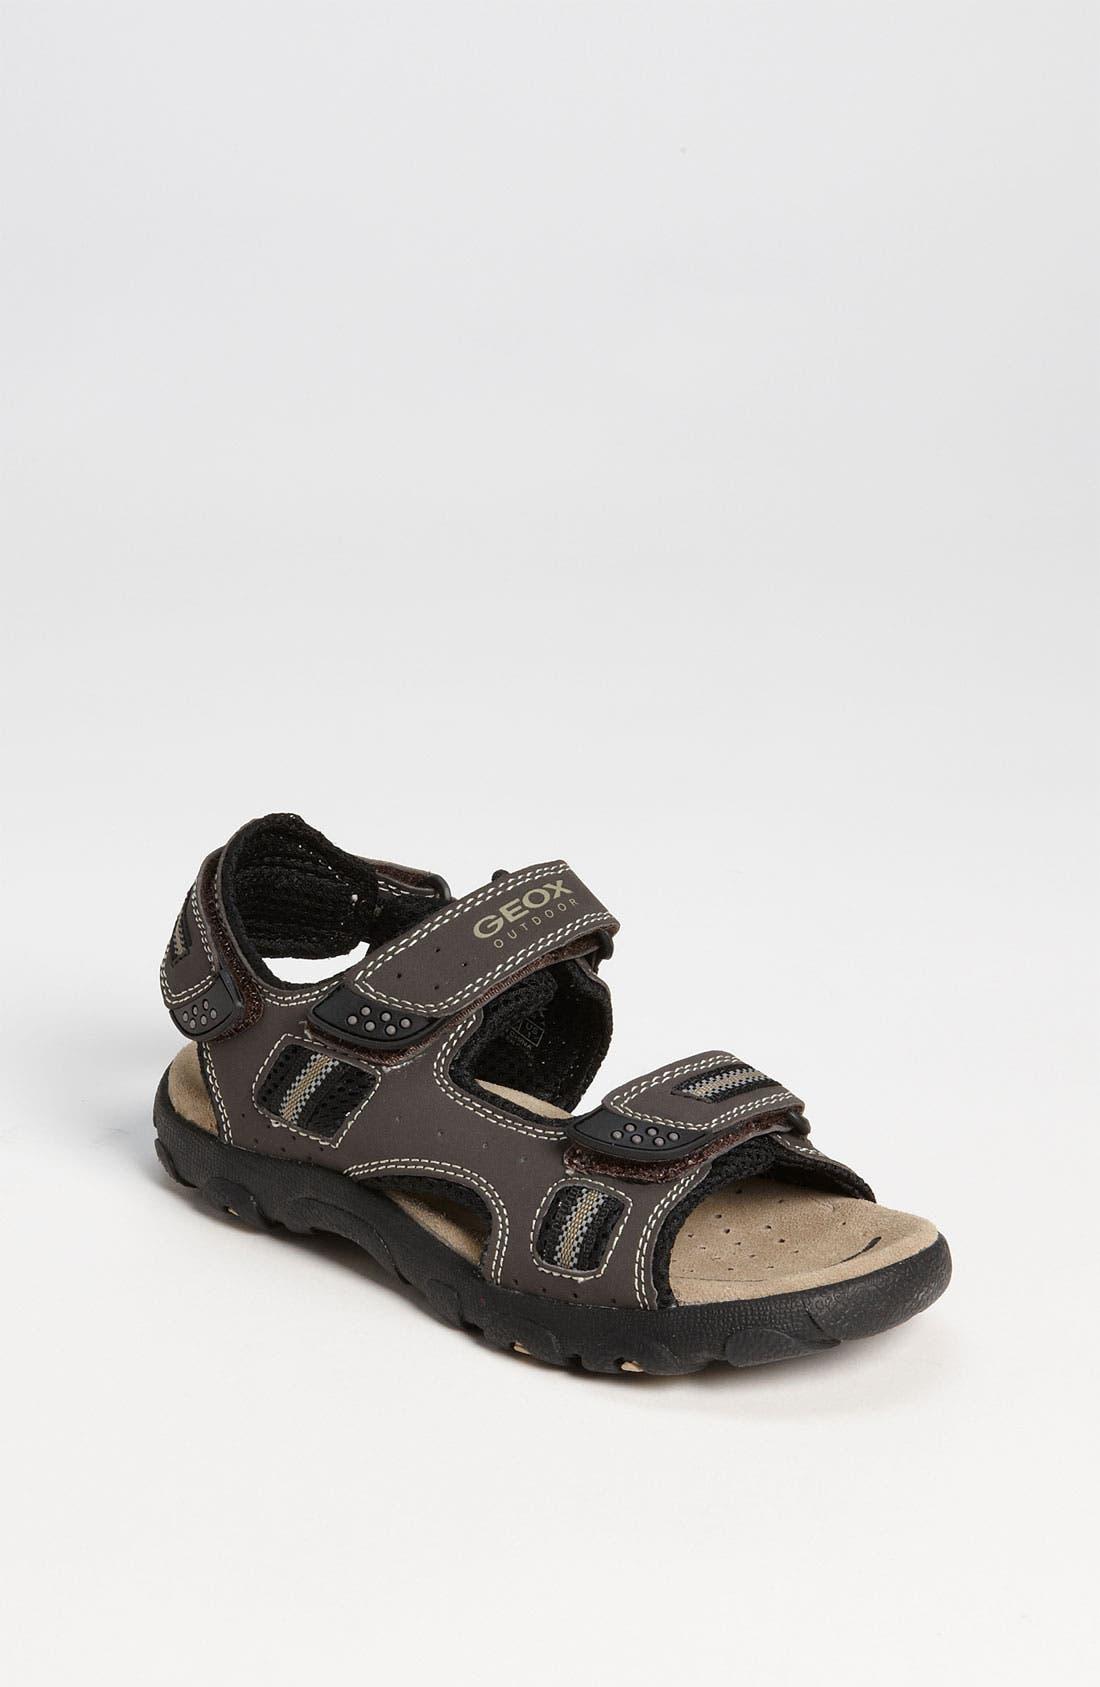 Alternate Image 1 Selected - Geox 'Strada' Sandal (Toddler, Little Kid & Big Kid)